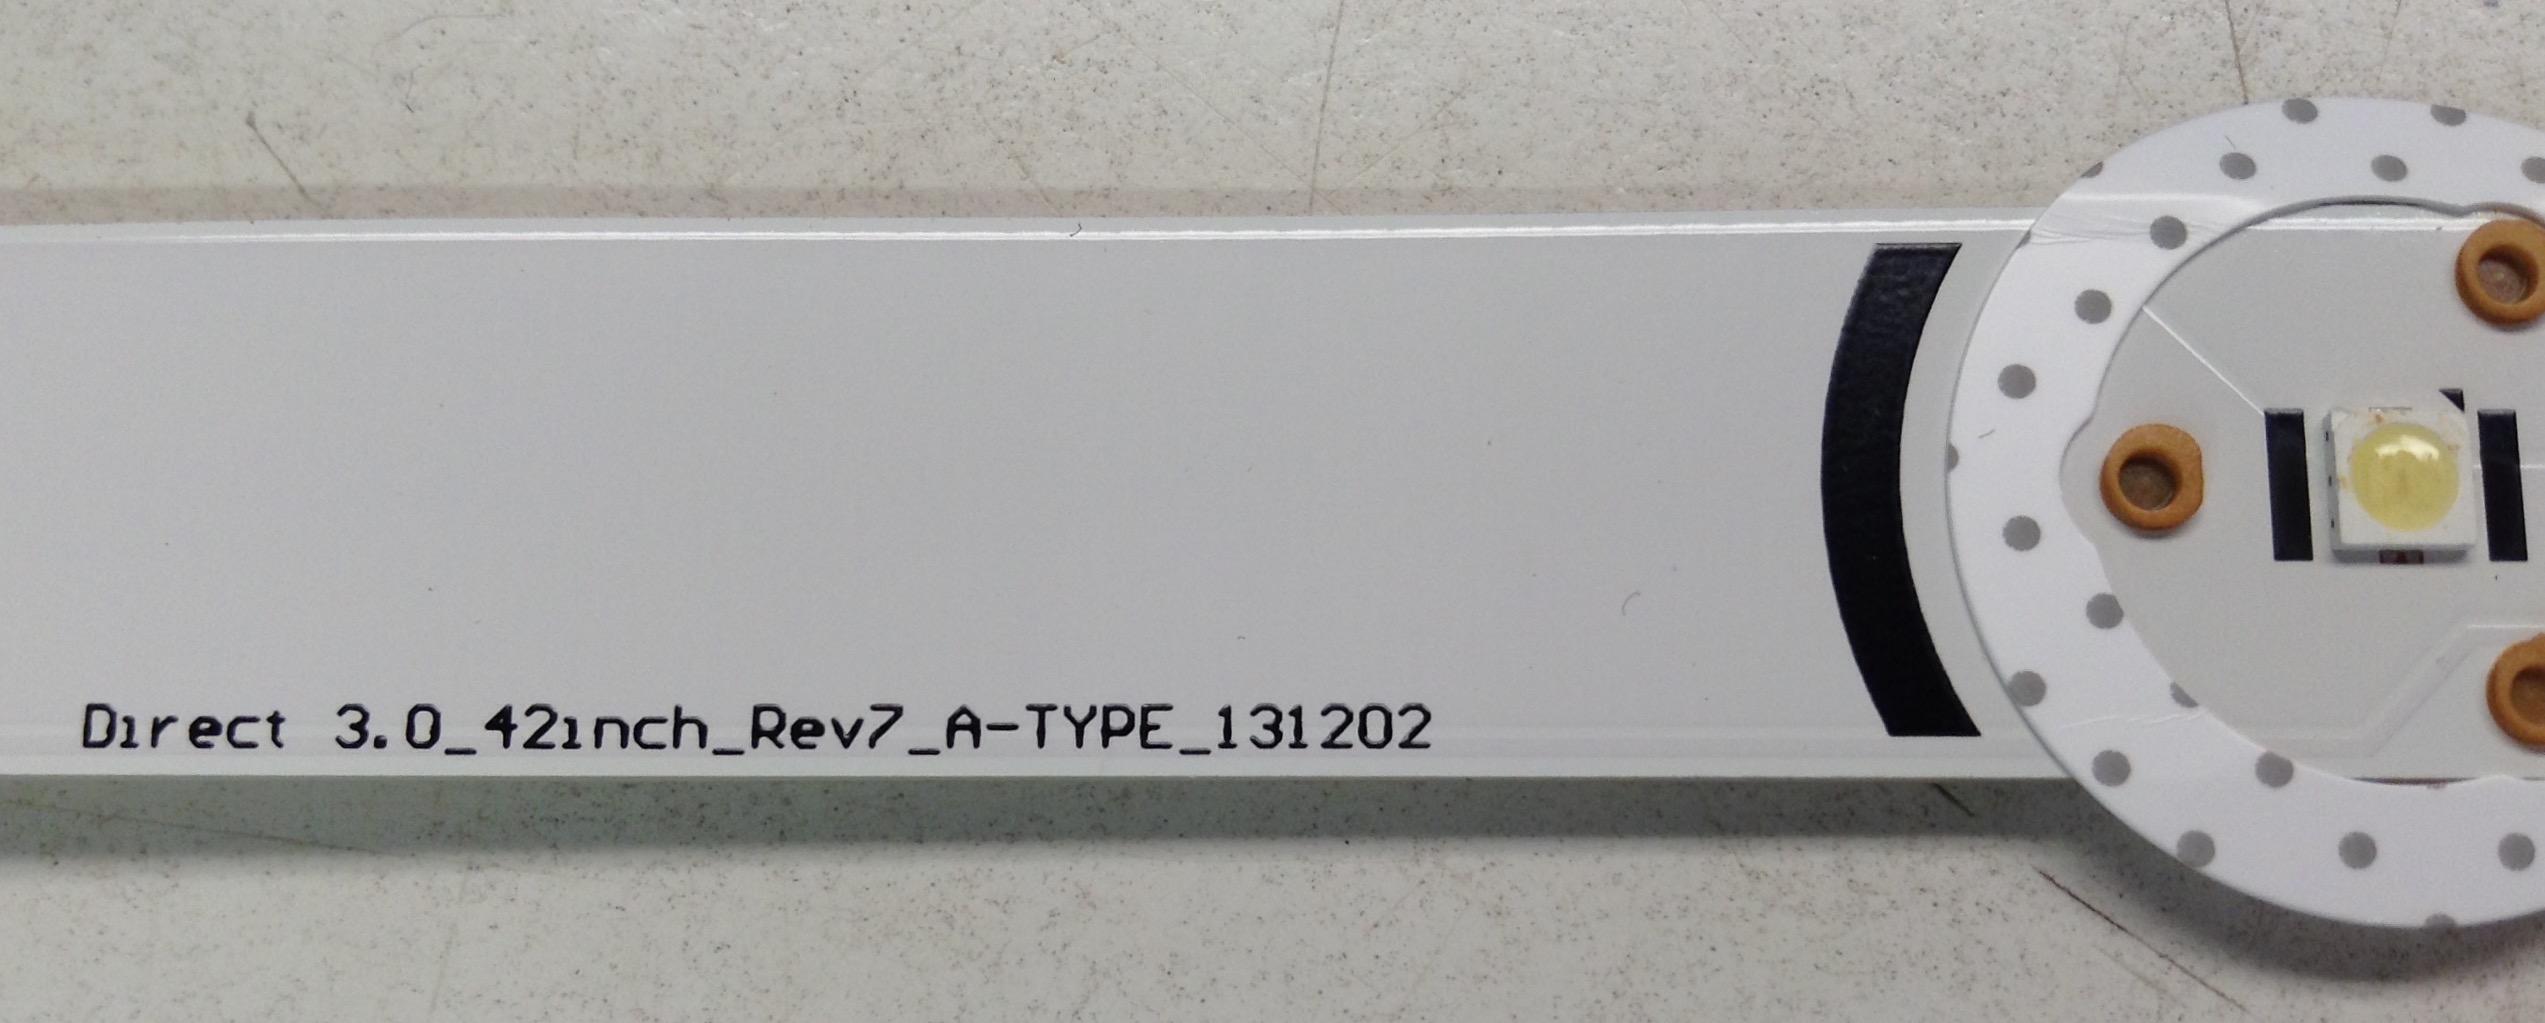 8 LG NC420DUN-VUBP1 LED Backlight Strips 42LB5800 42LB5600